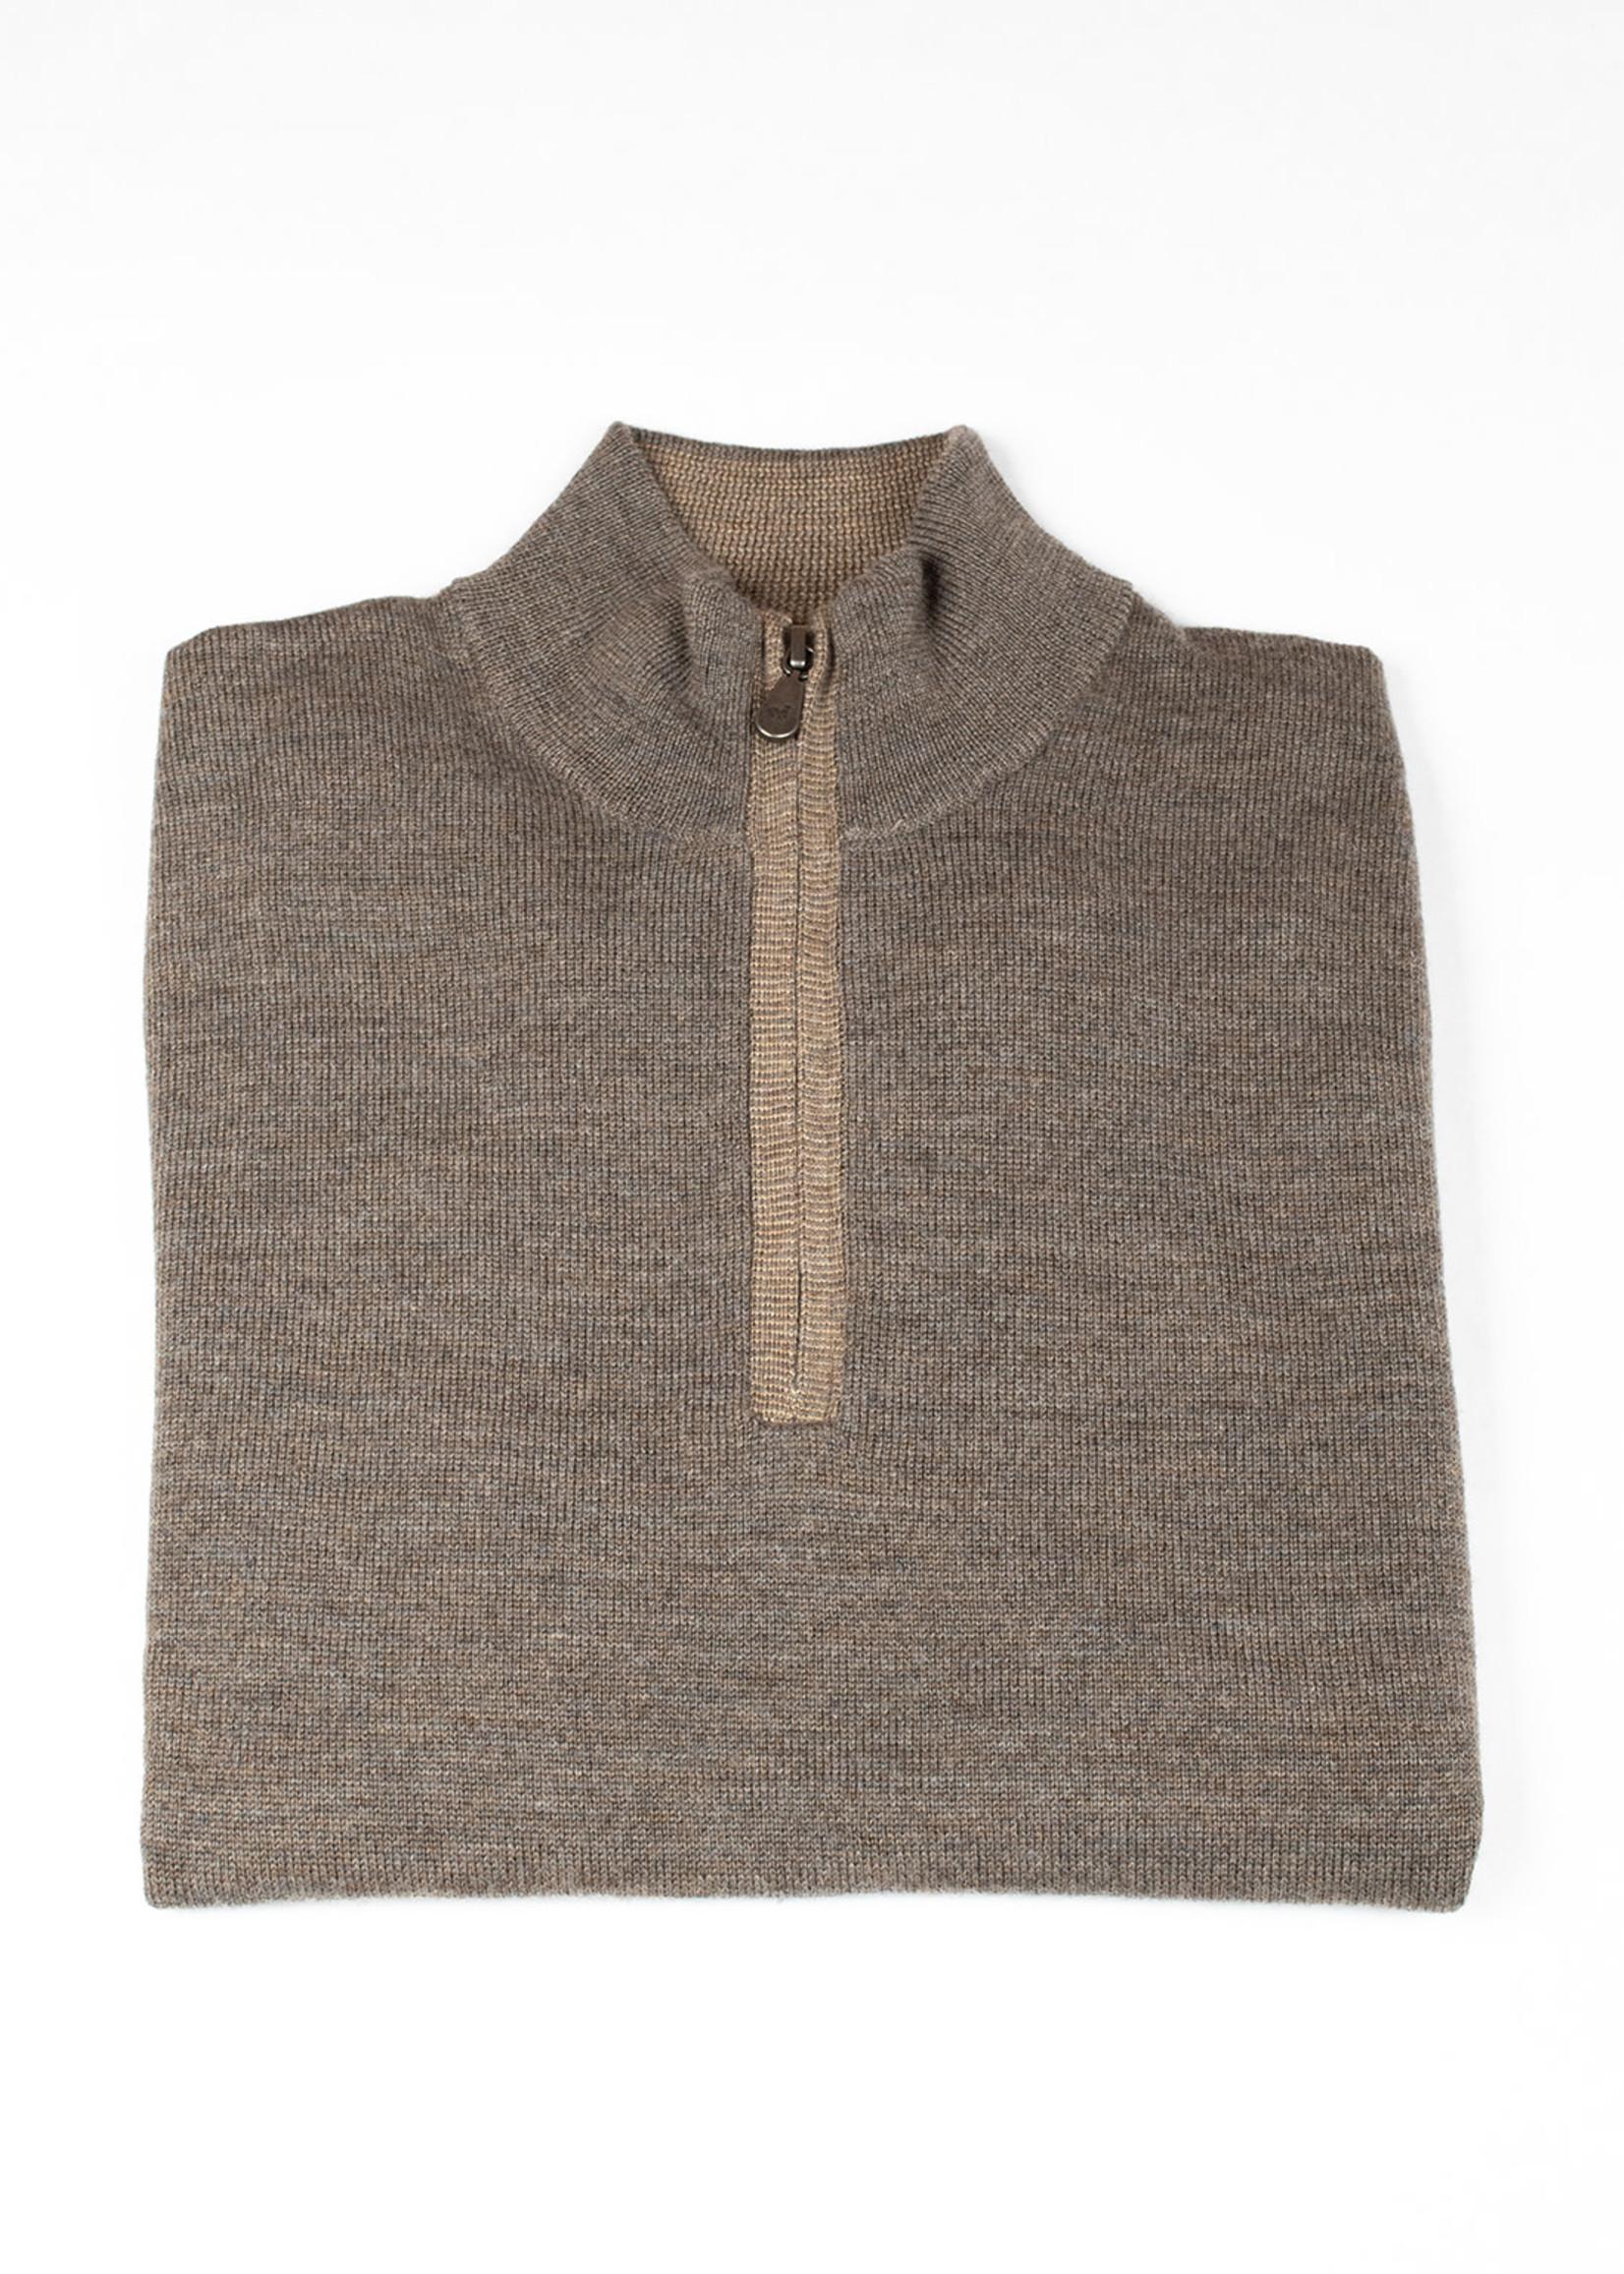 Raffi Raffi Taupe Merino Wool 1/4 Zip